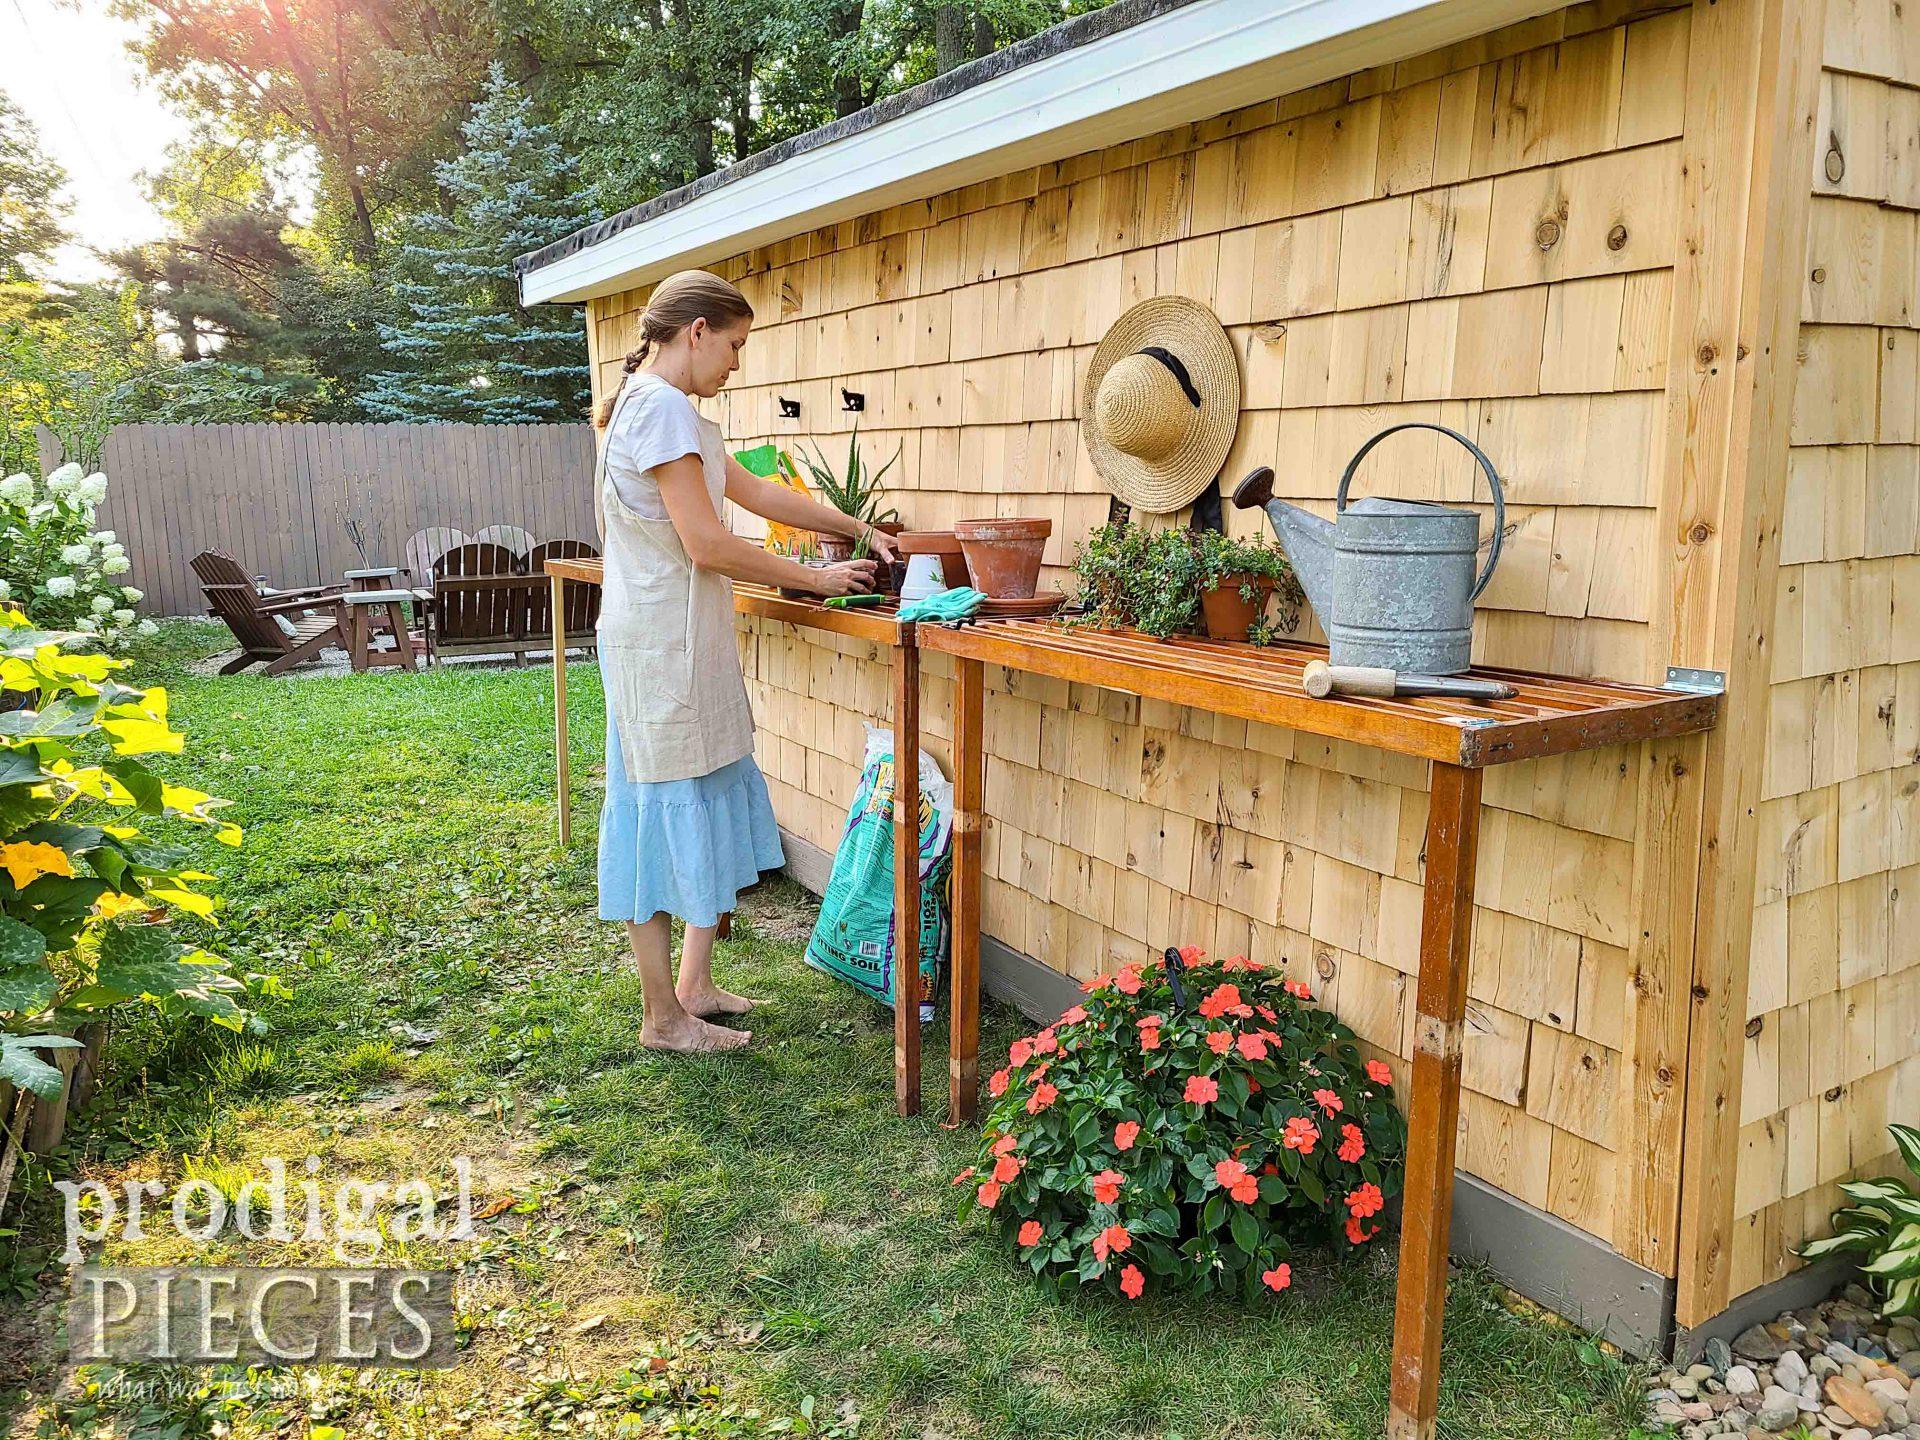 Larissa of Prodigal Pieces with her DIY Folding Potting Bench   prodigalpieces.com #prodigalpieces #garden #diy #homesteading #homedecor